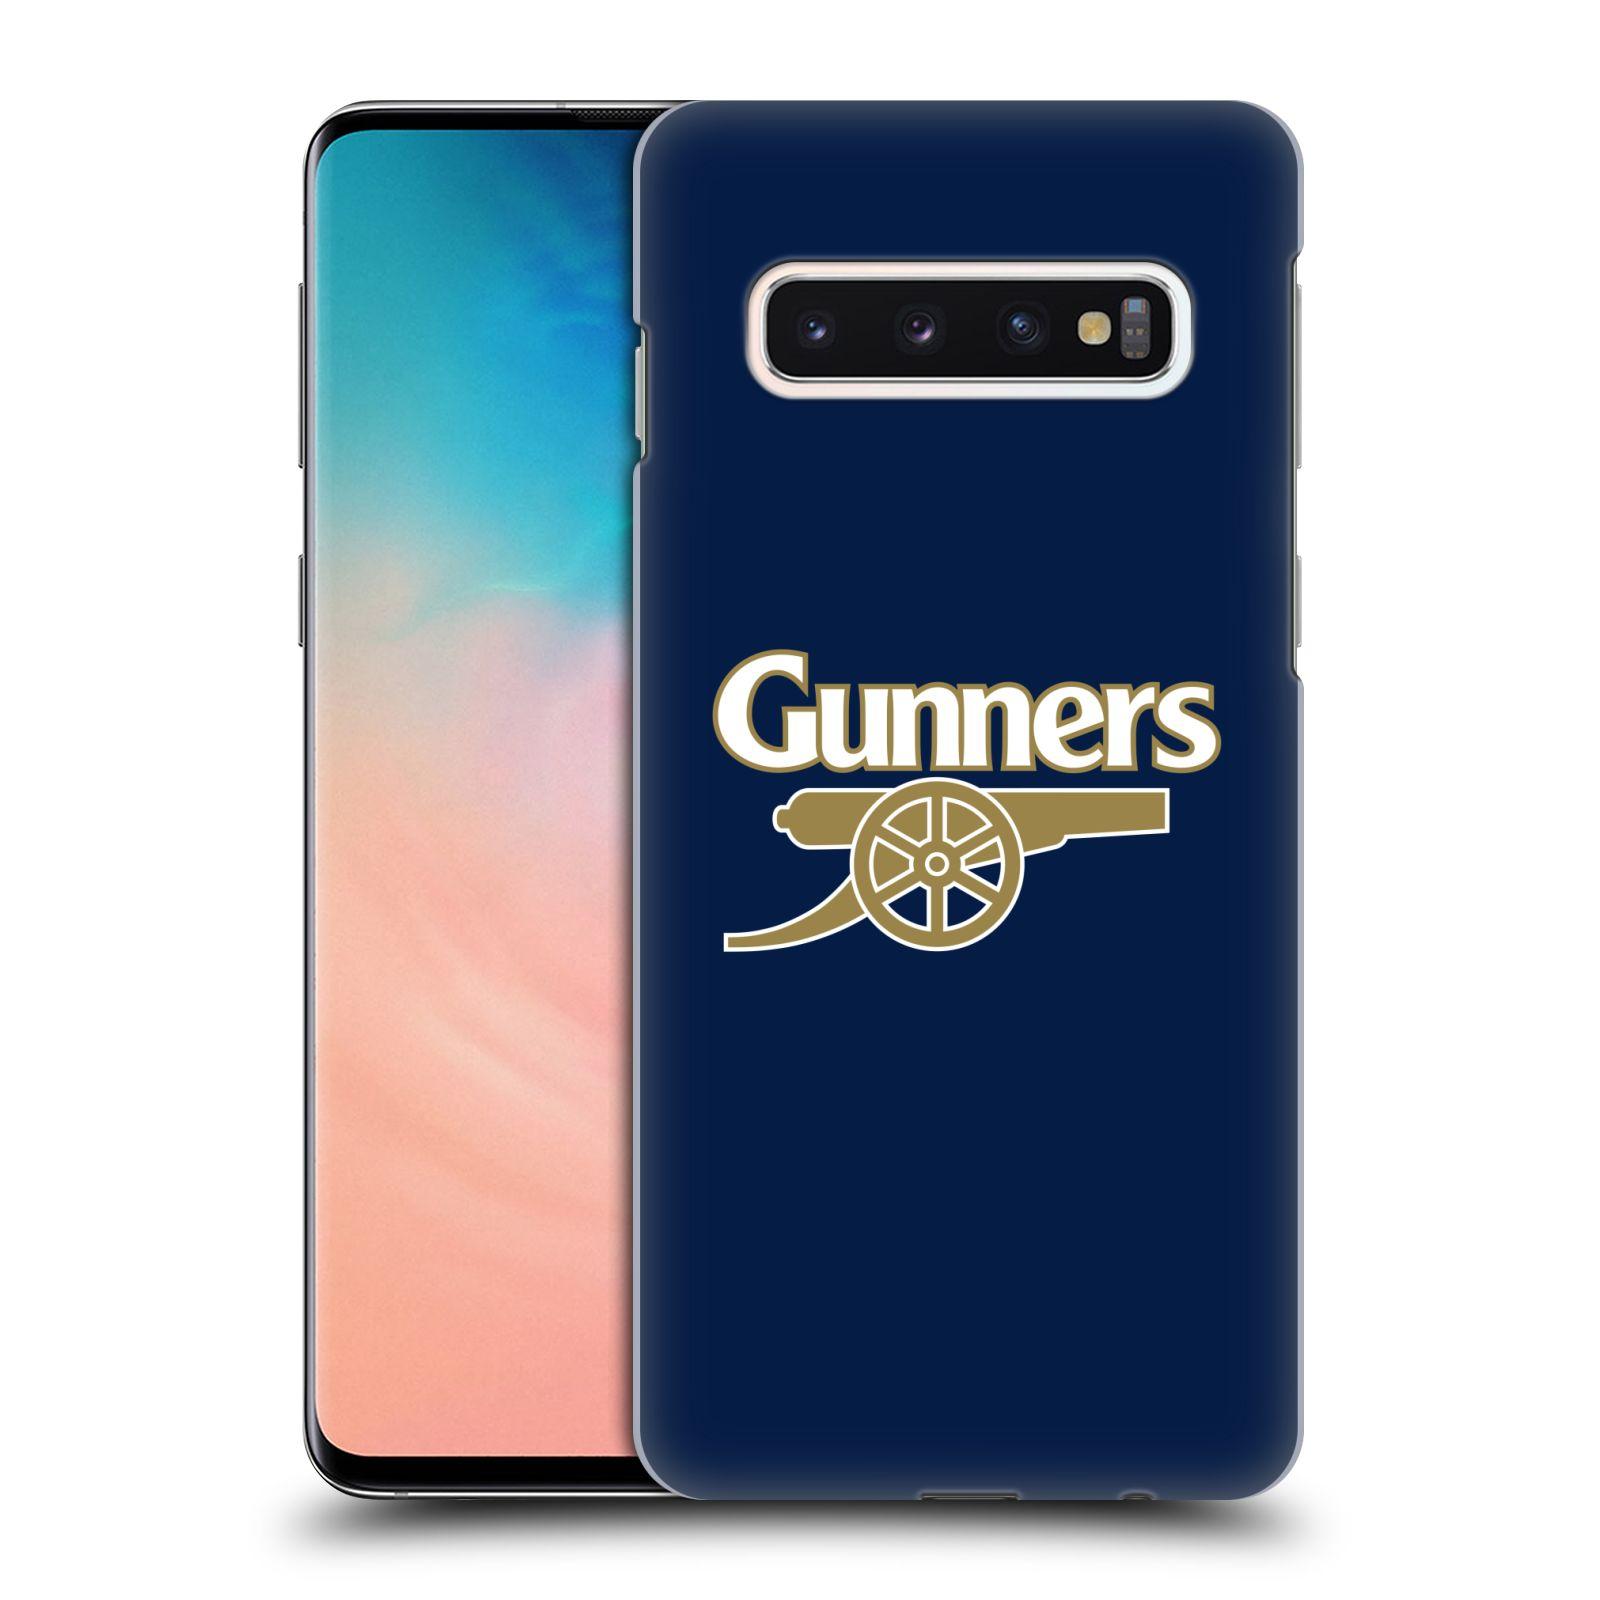 Plastové pouzdro na mobil Samsung Galaxy S10 - Head Case - Arsenal FC - Gunners